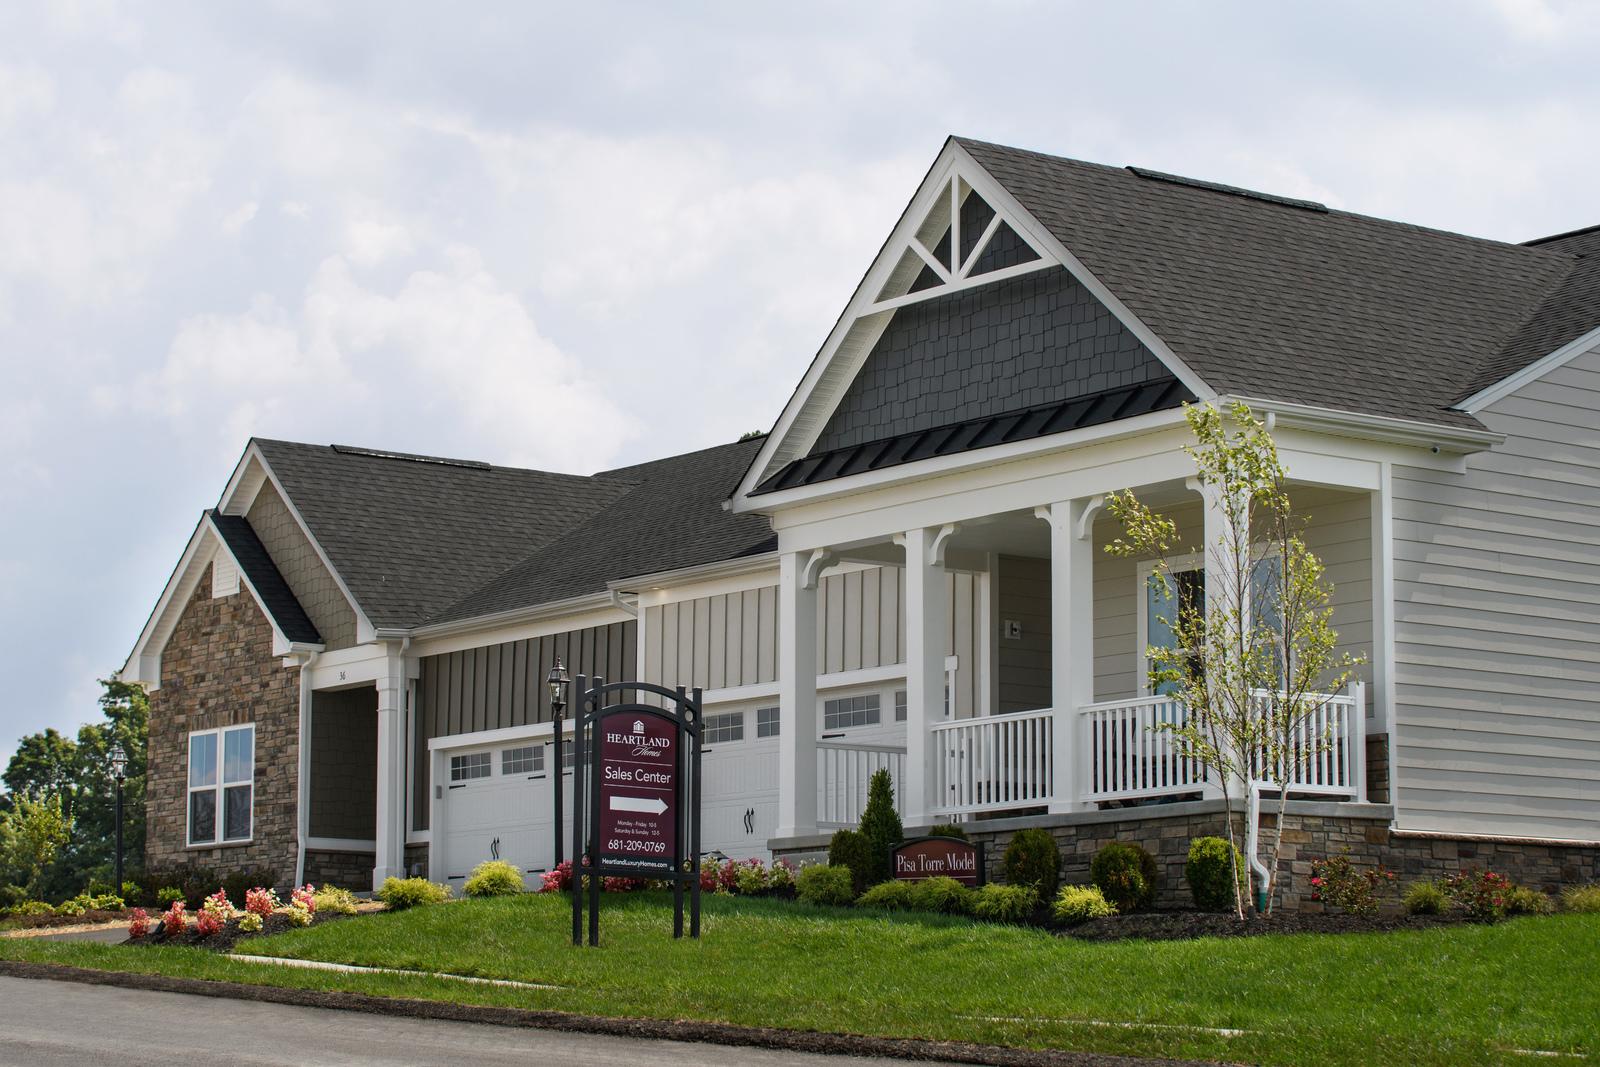 New pisa torre home model for sale heartland homes for Heartland builders